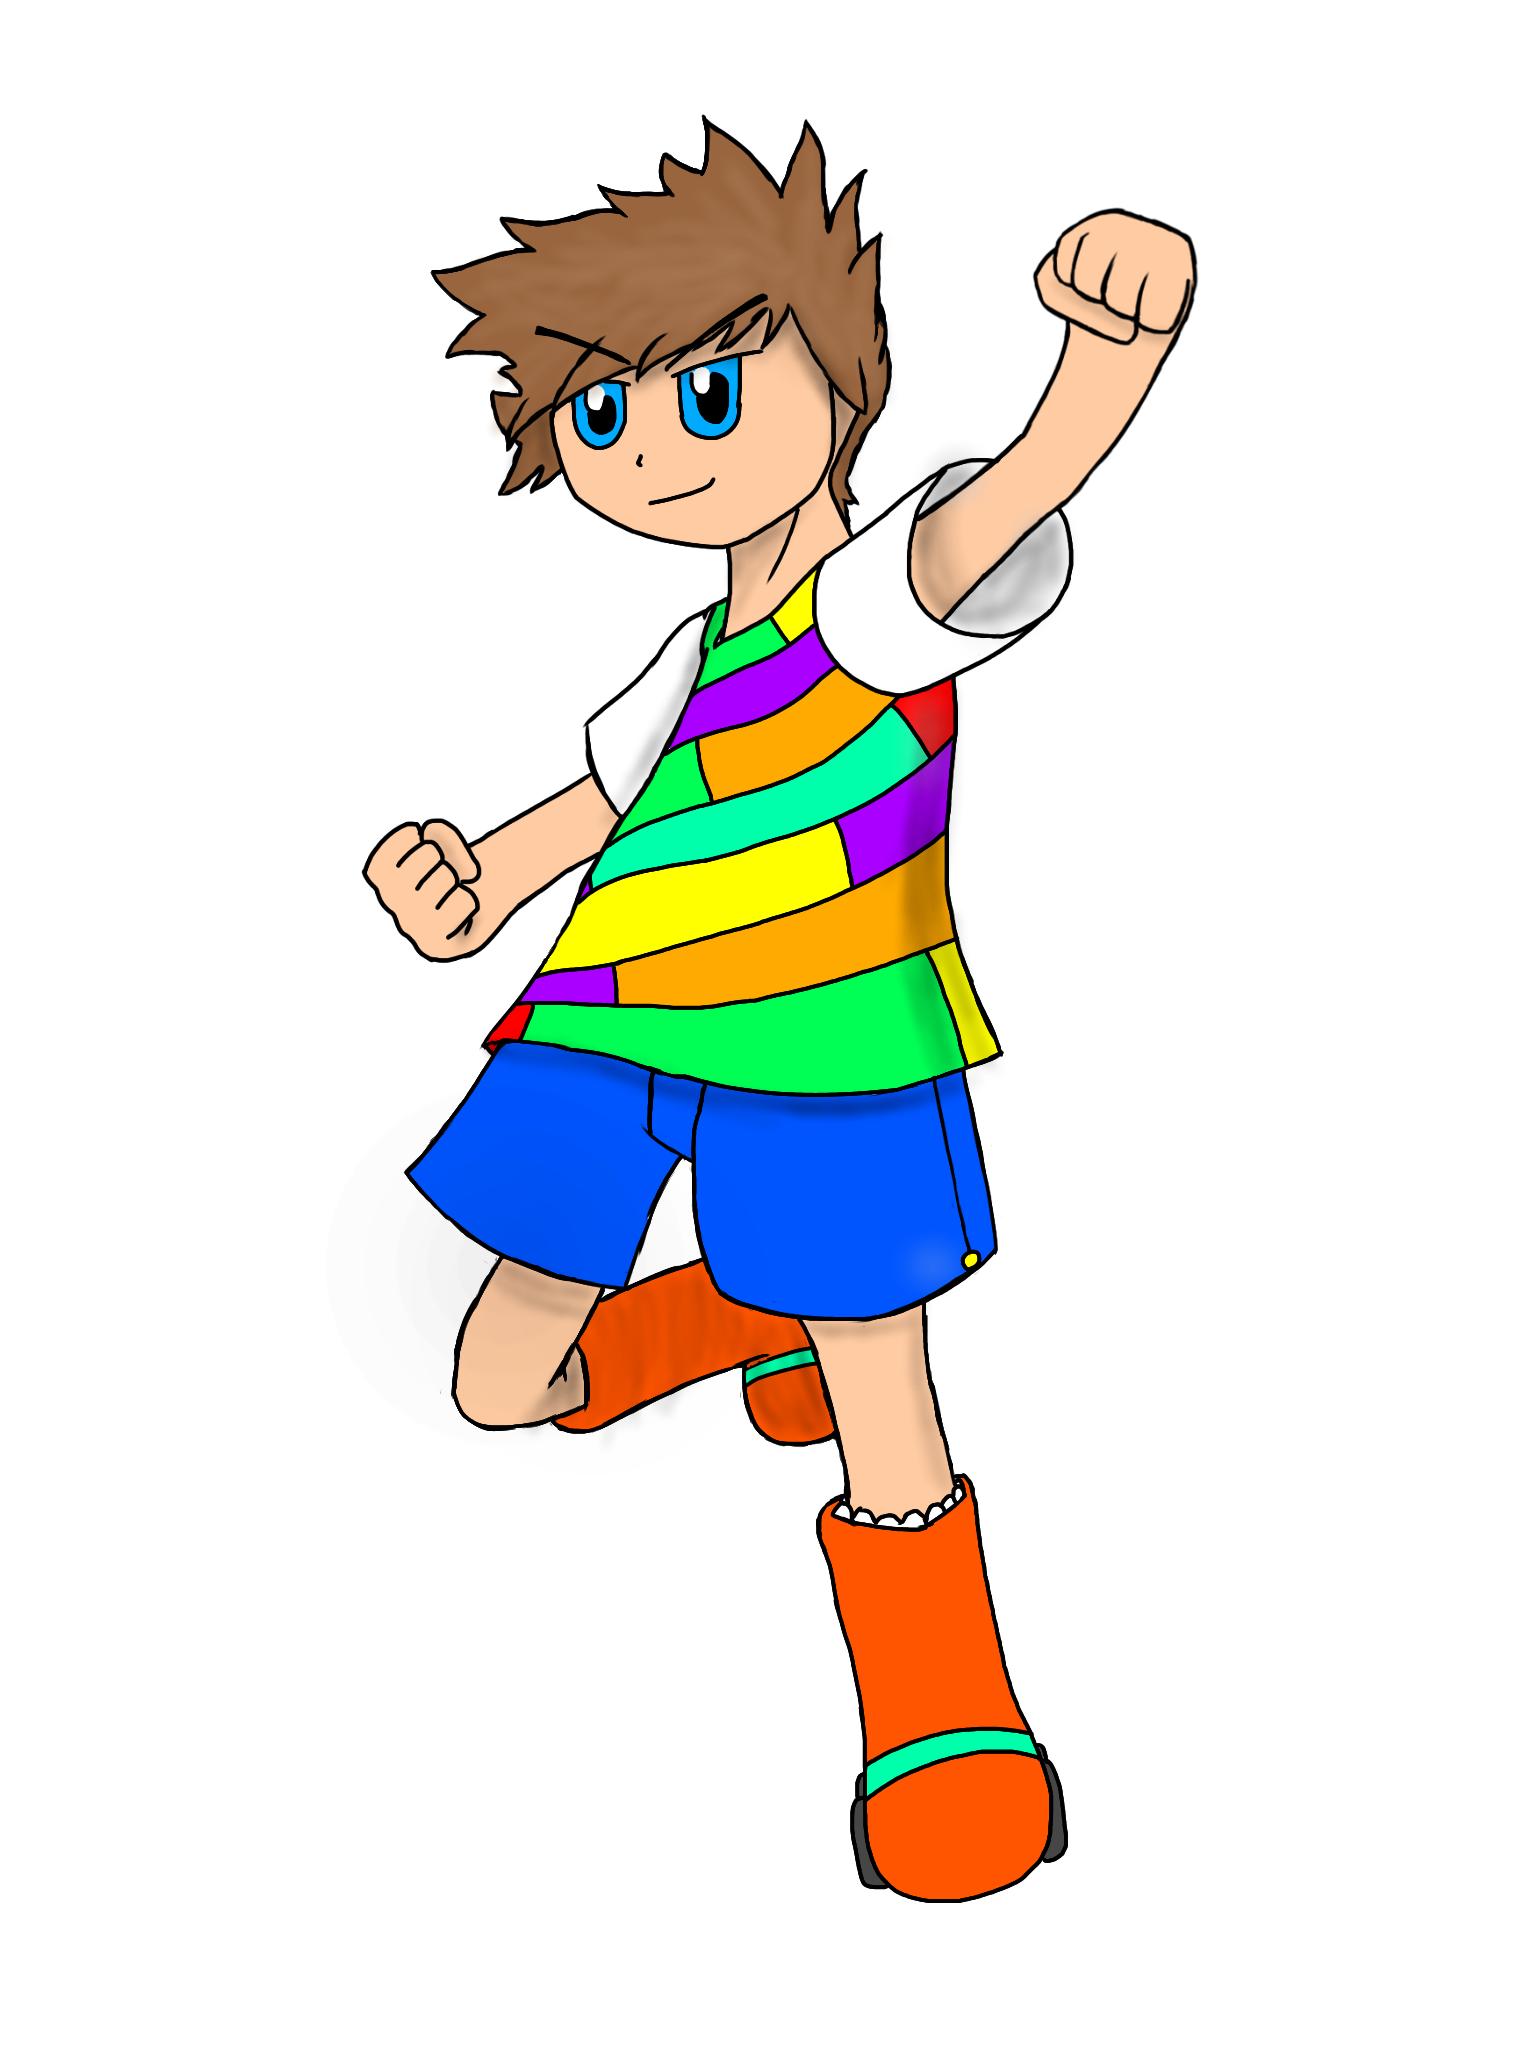 Masaru Character Art